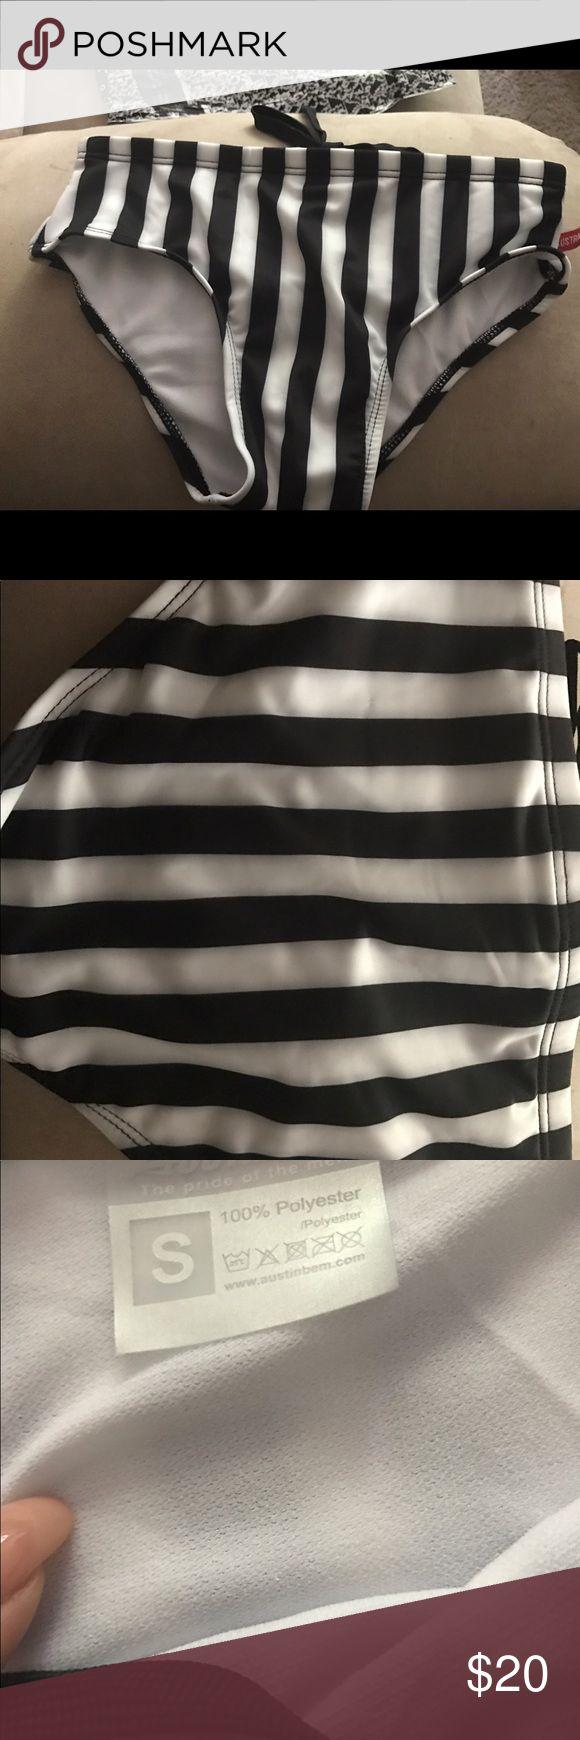 High waisted black and white stripe bikini bottom Brand new never worn size small. Needs a new home. Make an offer ASOS Swim Bikinis